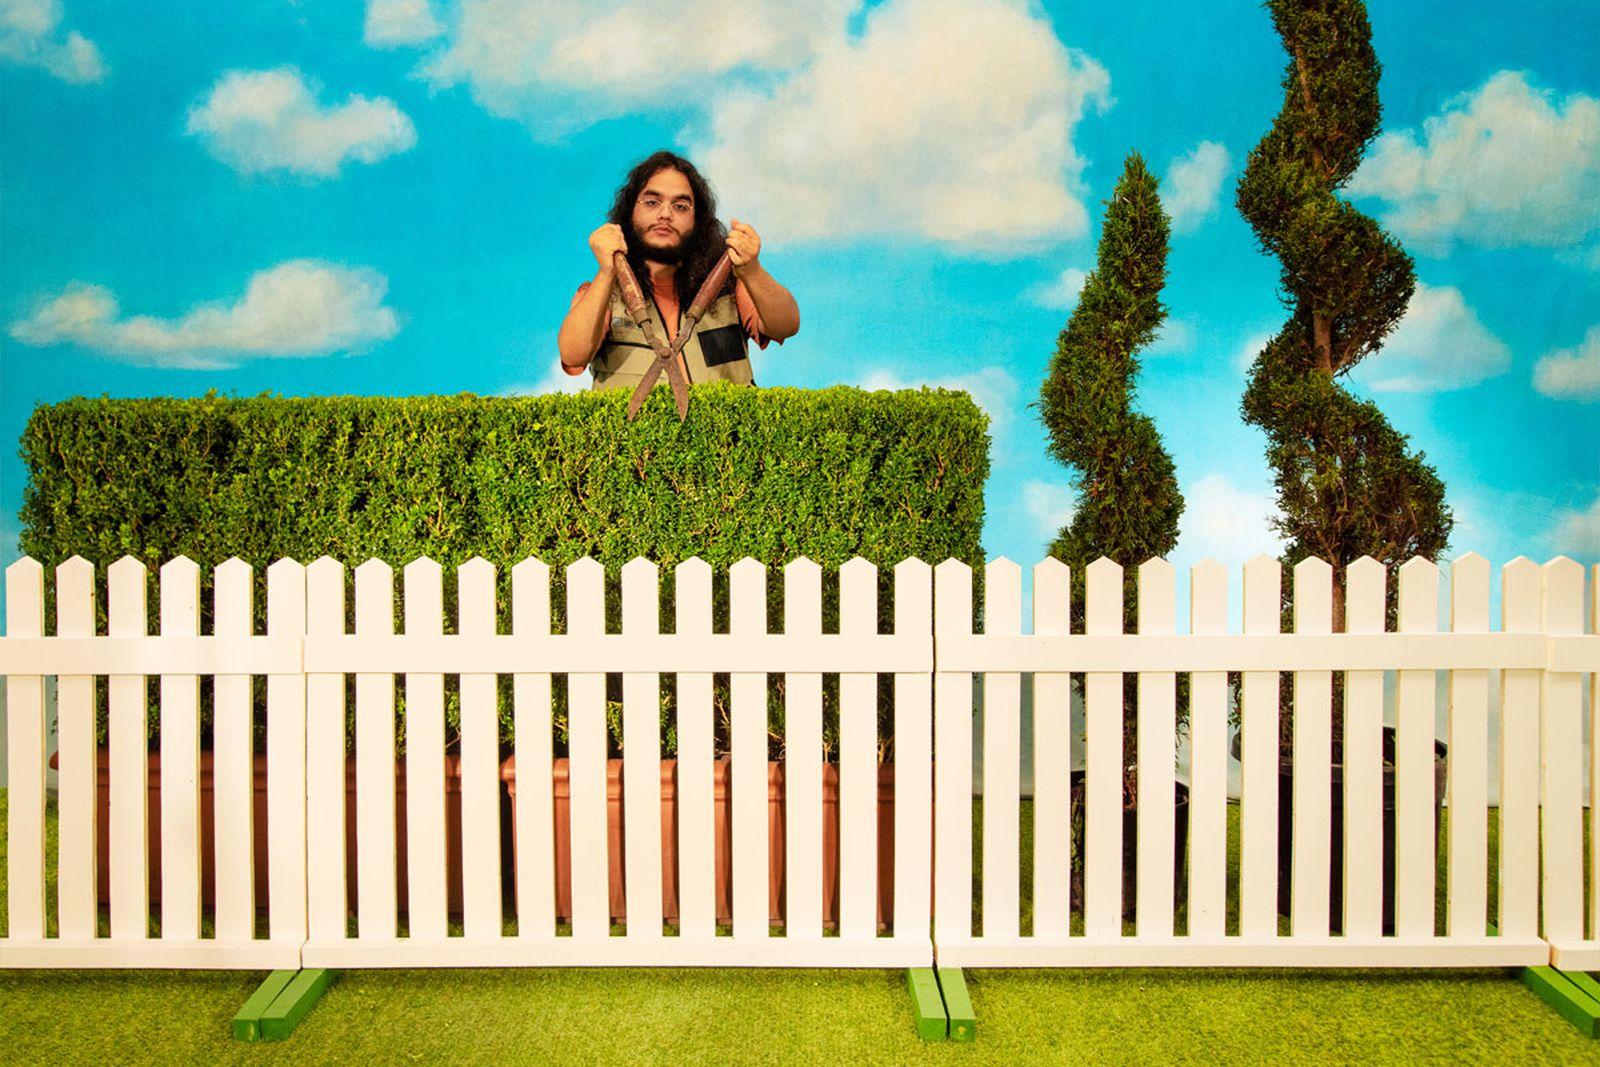 adidas gardening collection